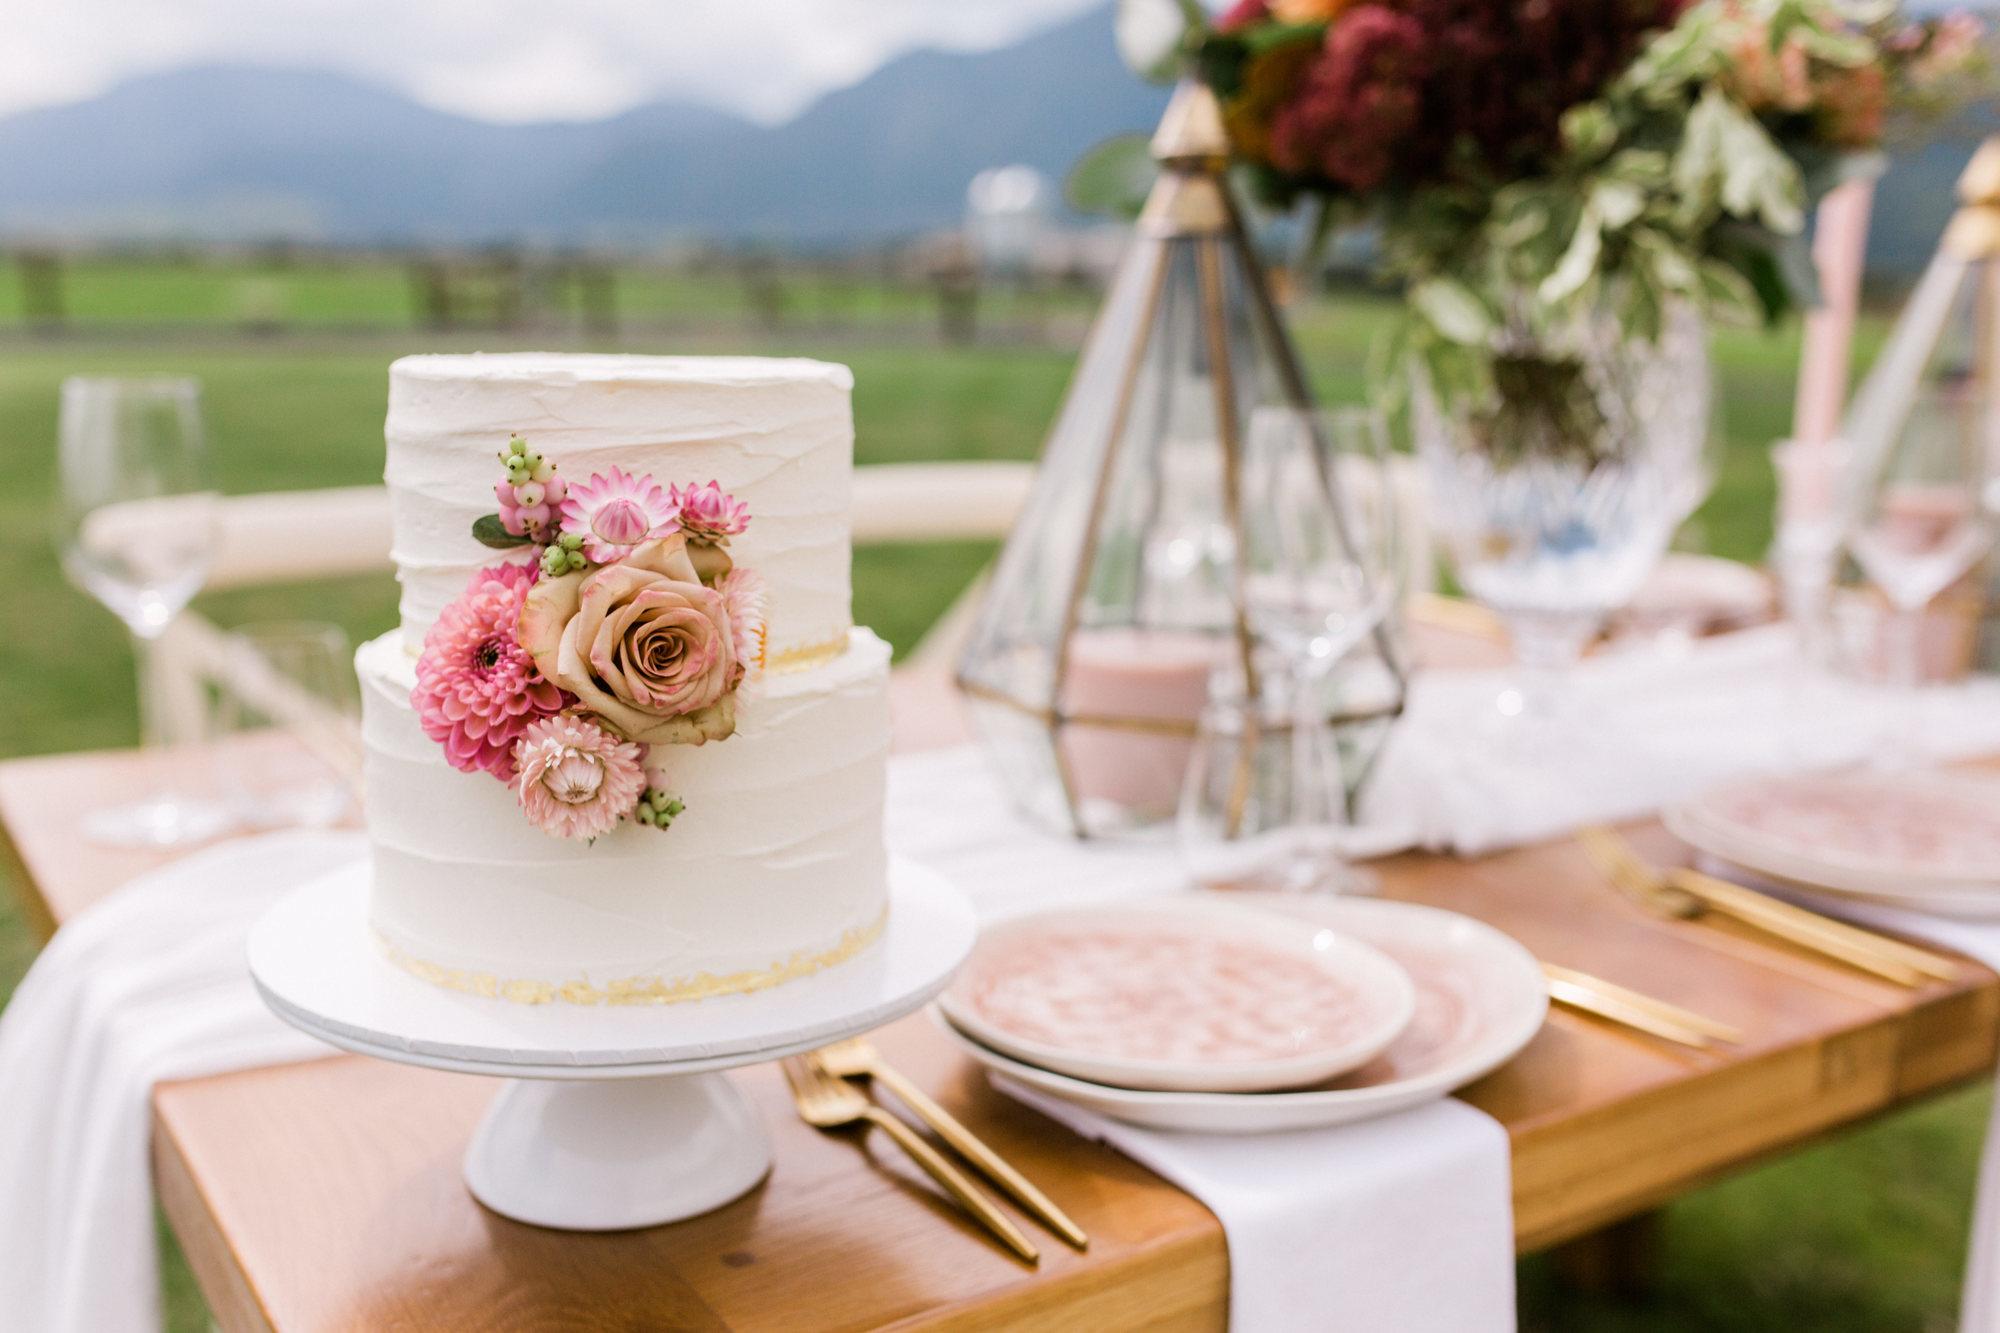 matamata country blush styled shoot © Sweet Events Photography 2018-7012.jpg